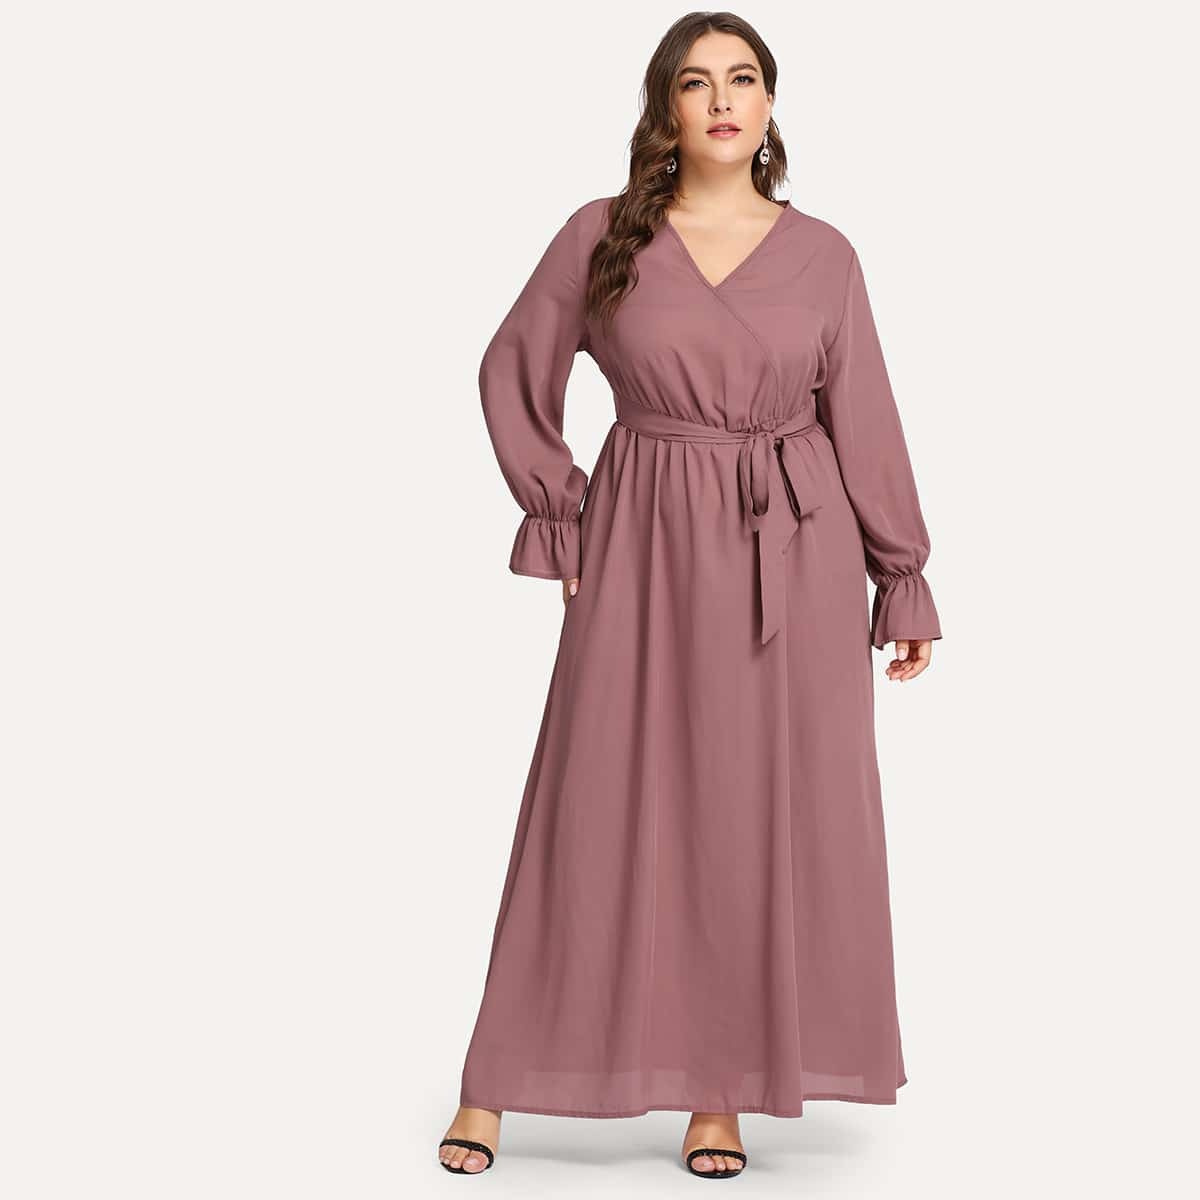 Roze  Casual Vlak Grote maten jurken Kant